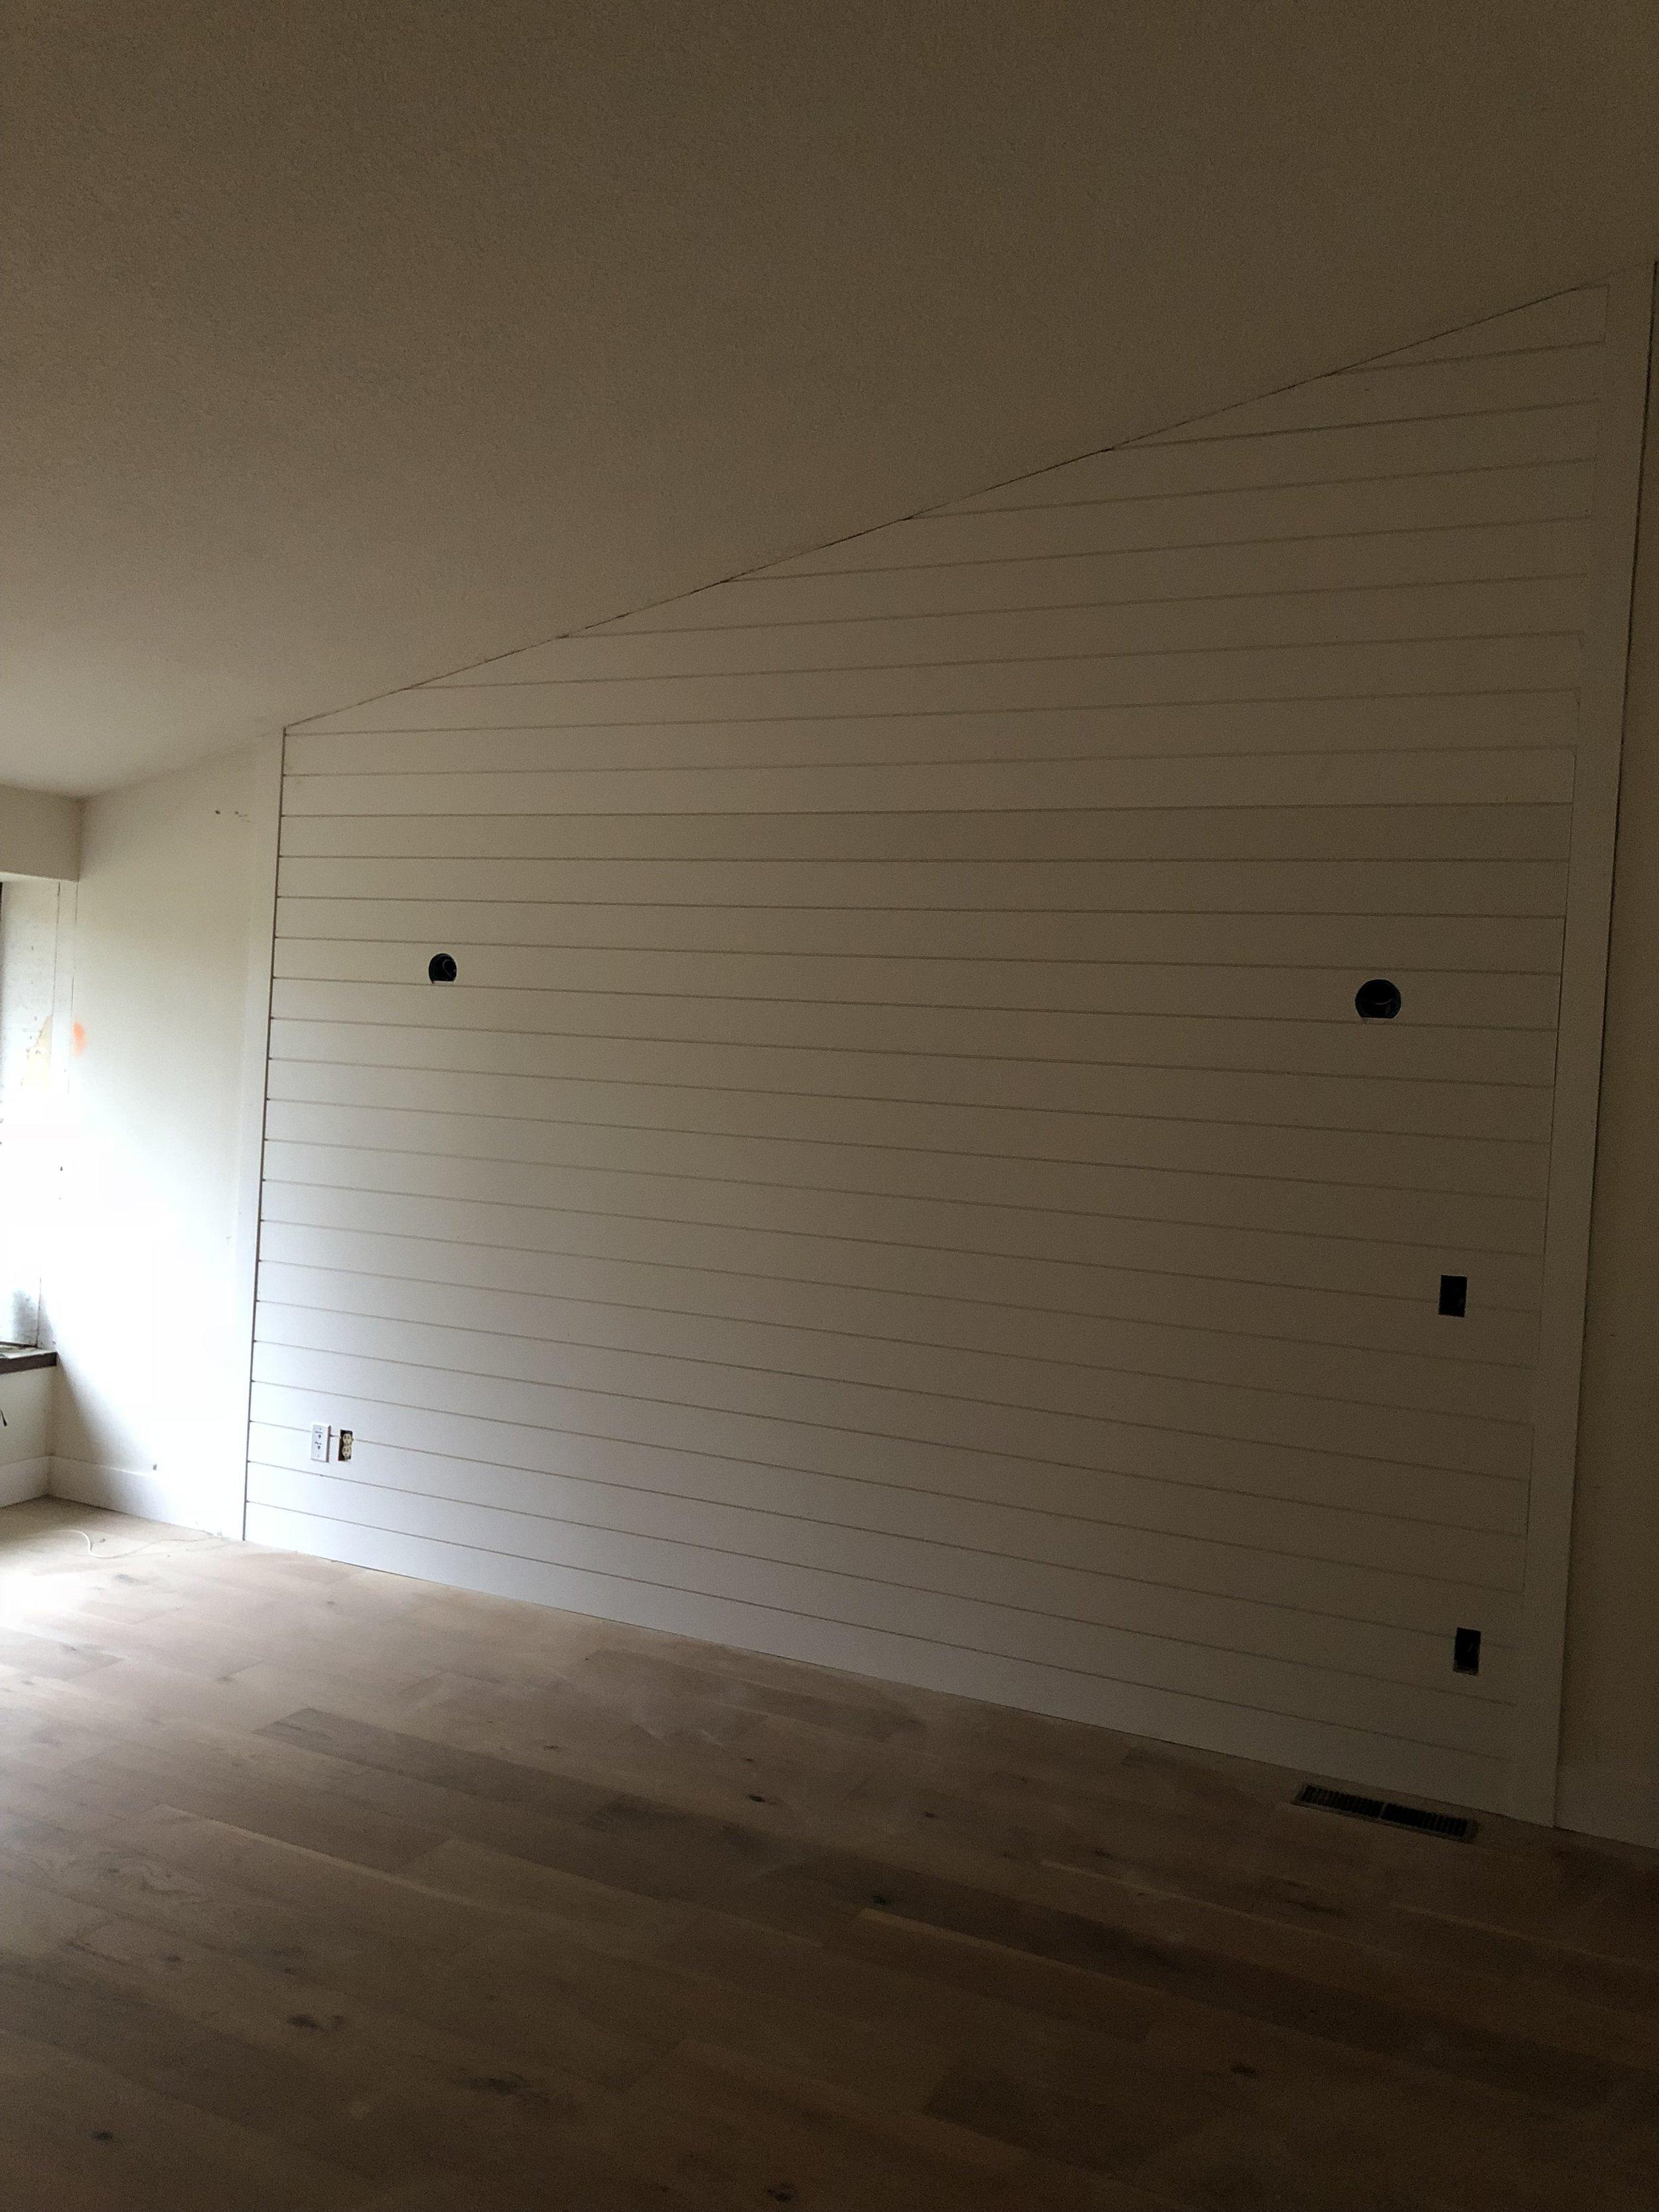 Added hardwoods, shiplap, new paint, wall light fixtures